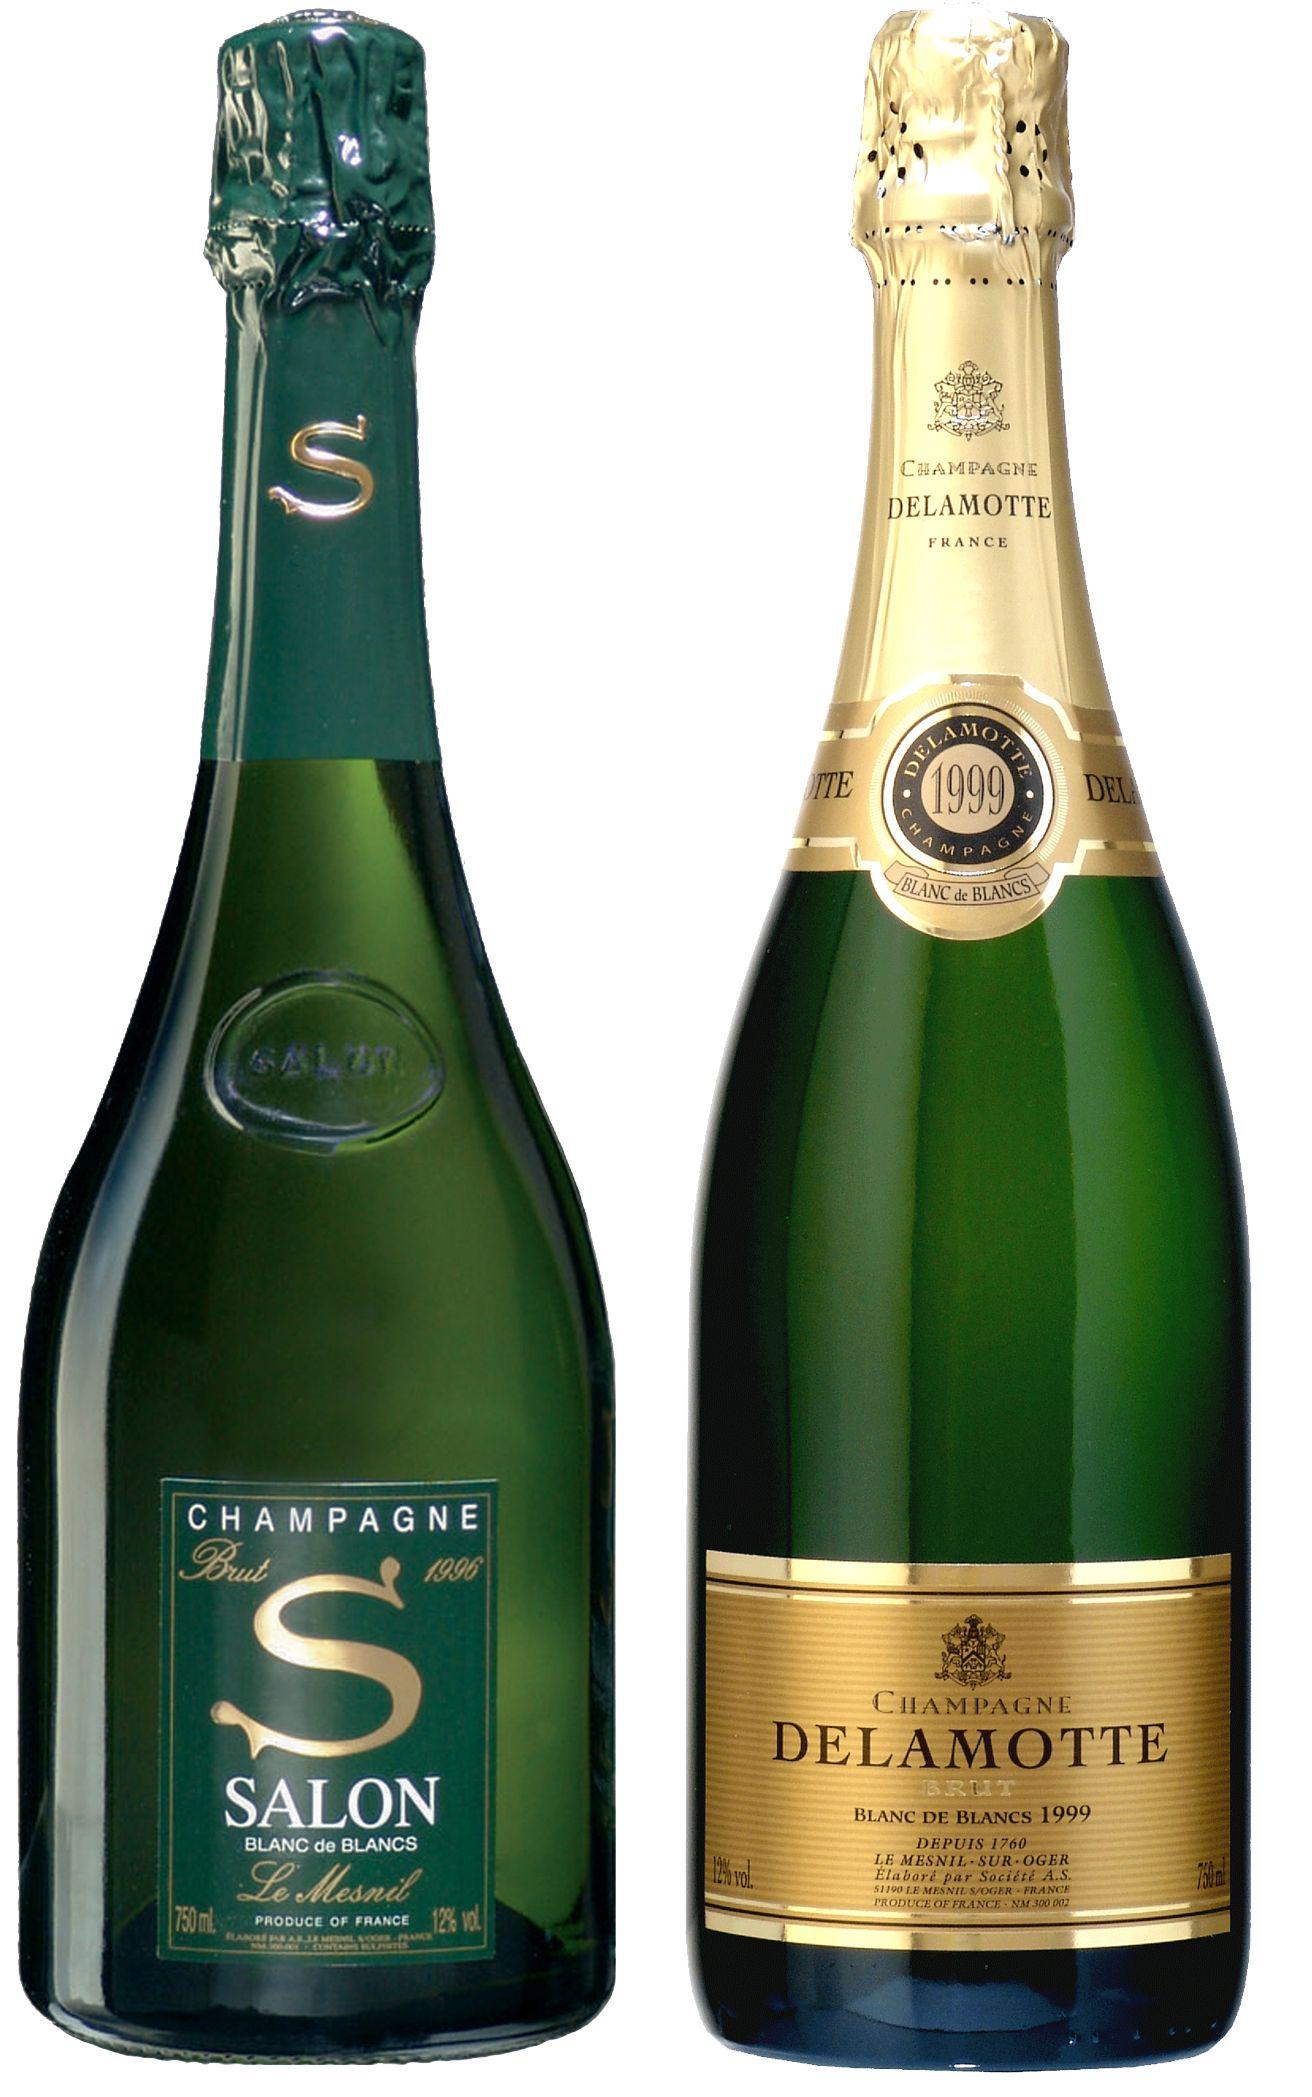 Salon Champagne | 1996 Salon Le Mesnil Brut Blanc De Blancs Champagne